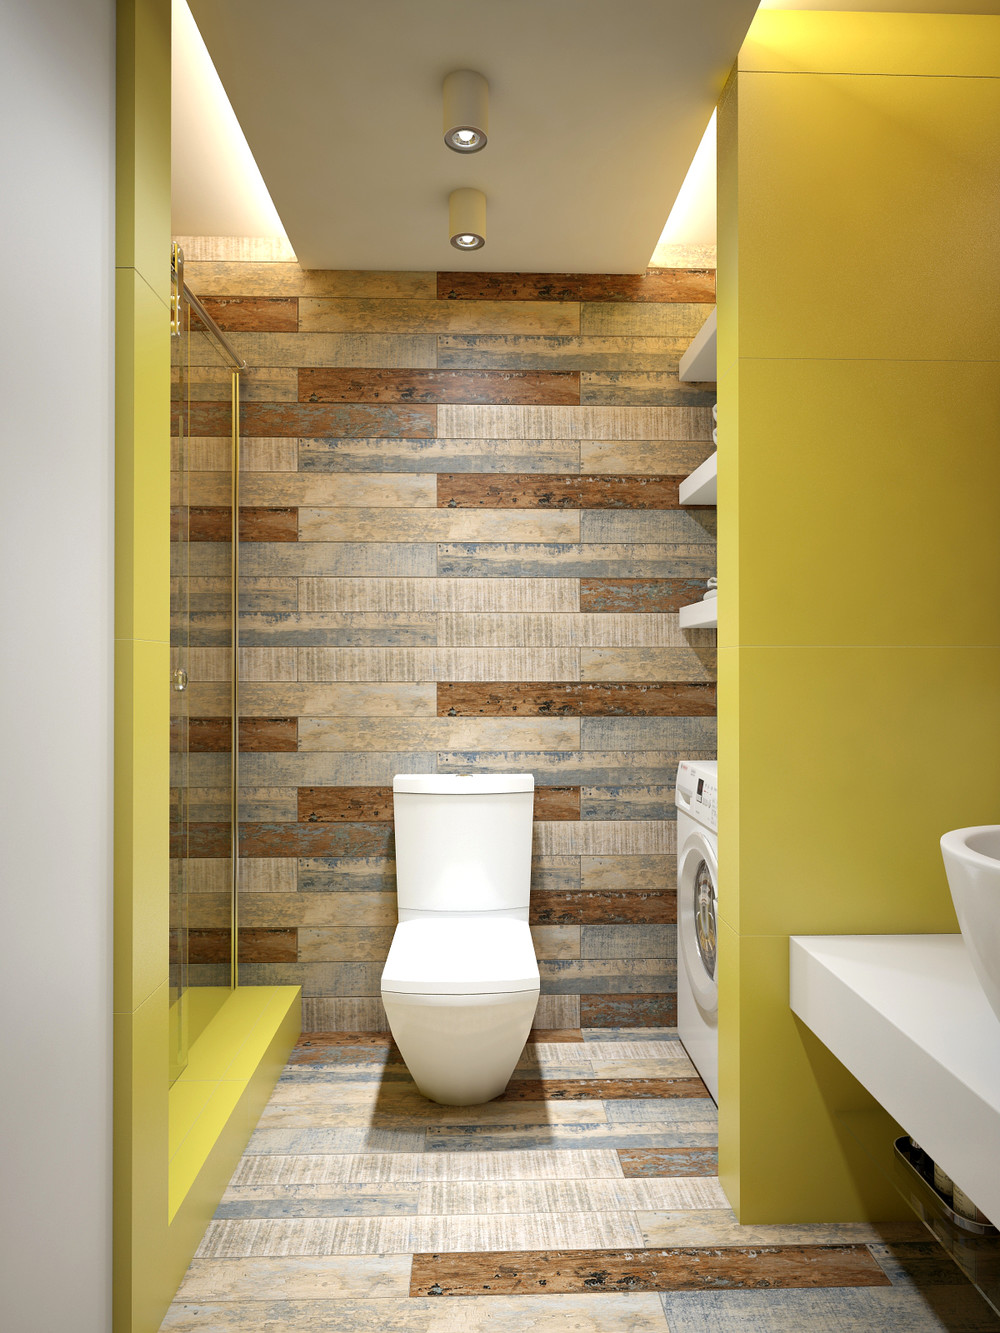 3 Open Studio Apartment Designs on Contemporary:kkgewzoz5M4= Small Bathroom Ideas  id=87293